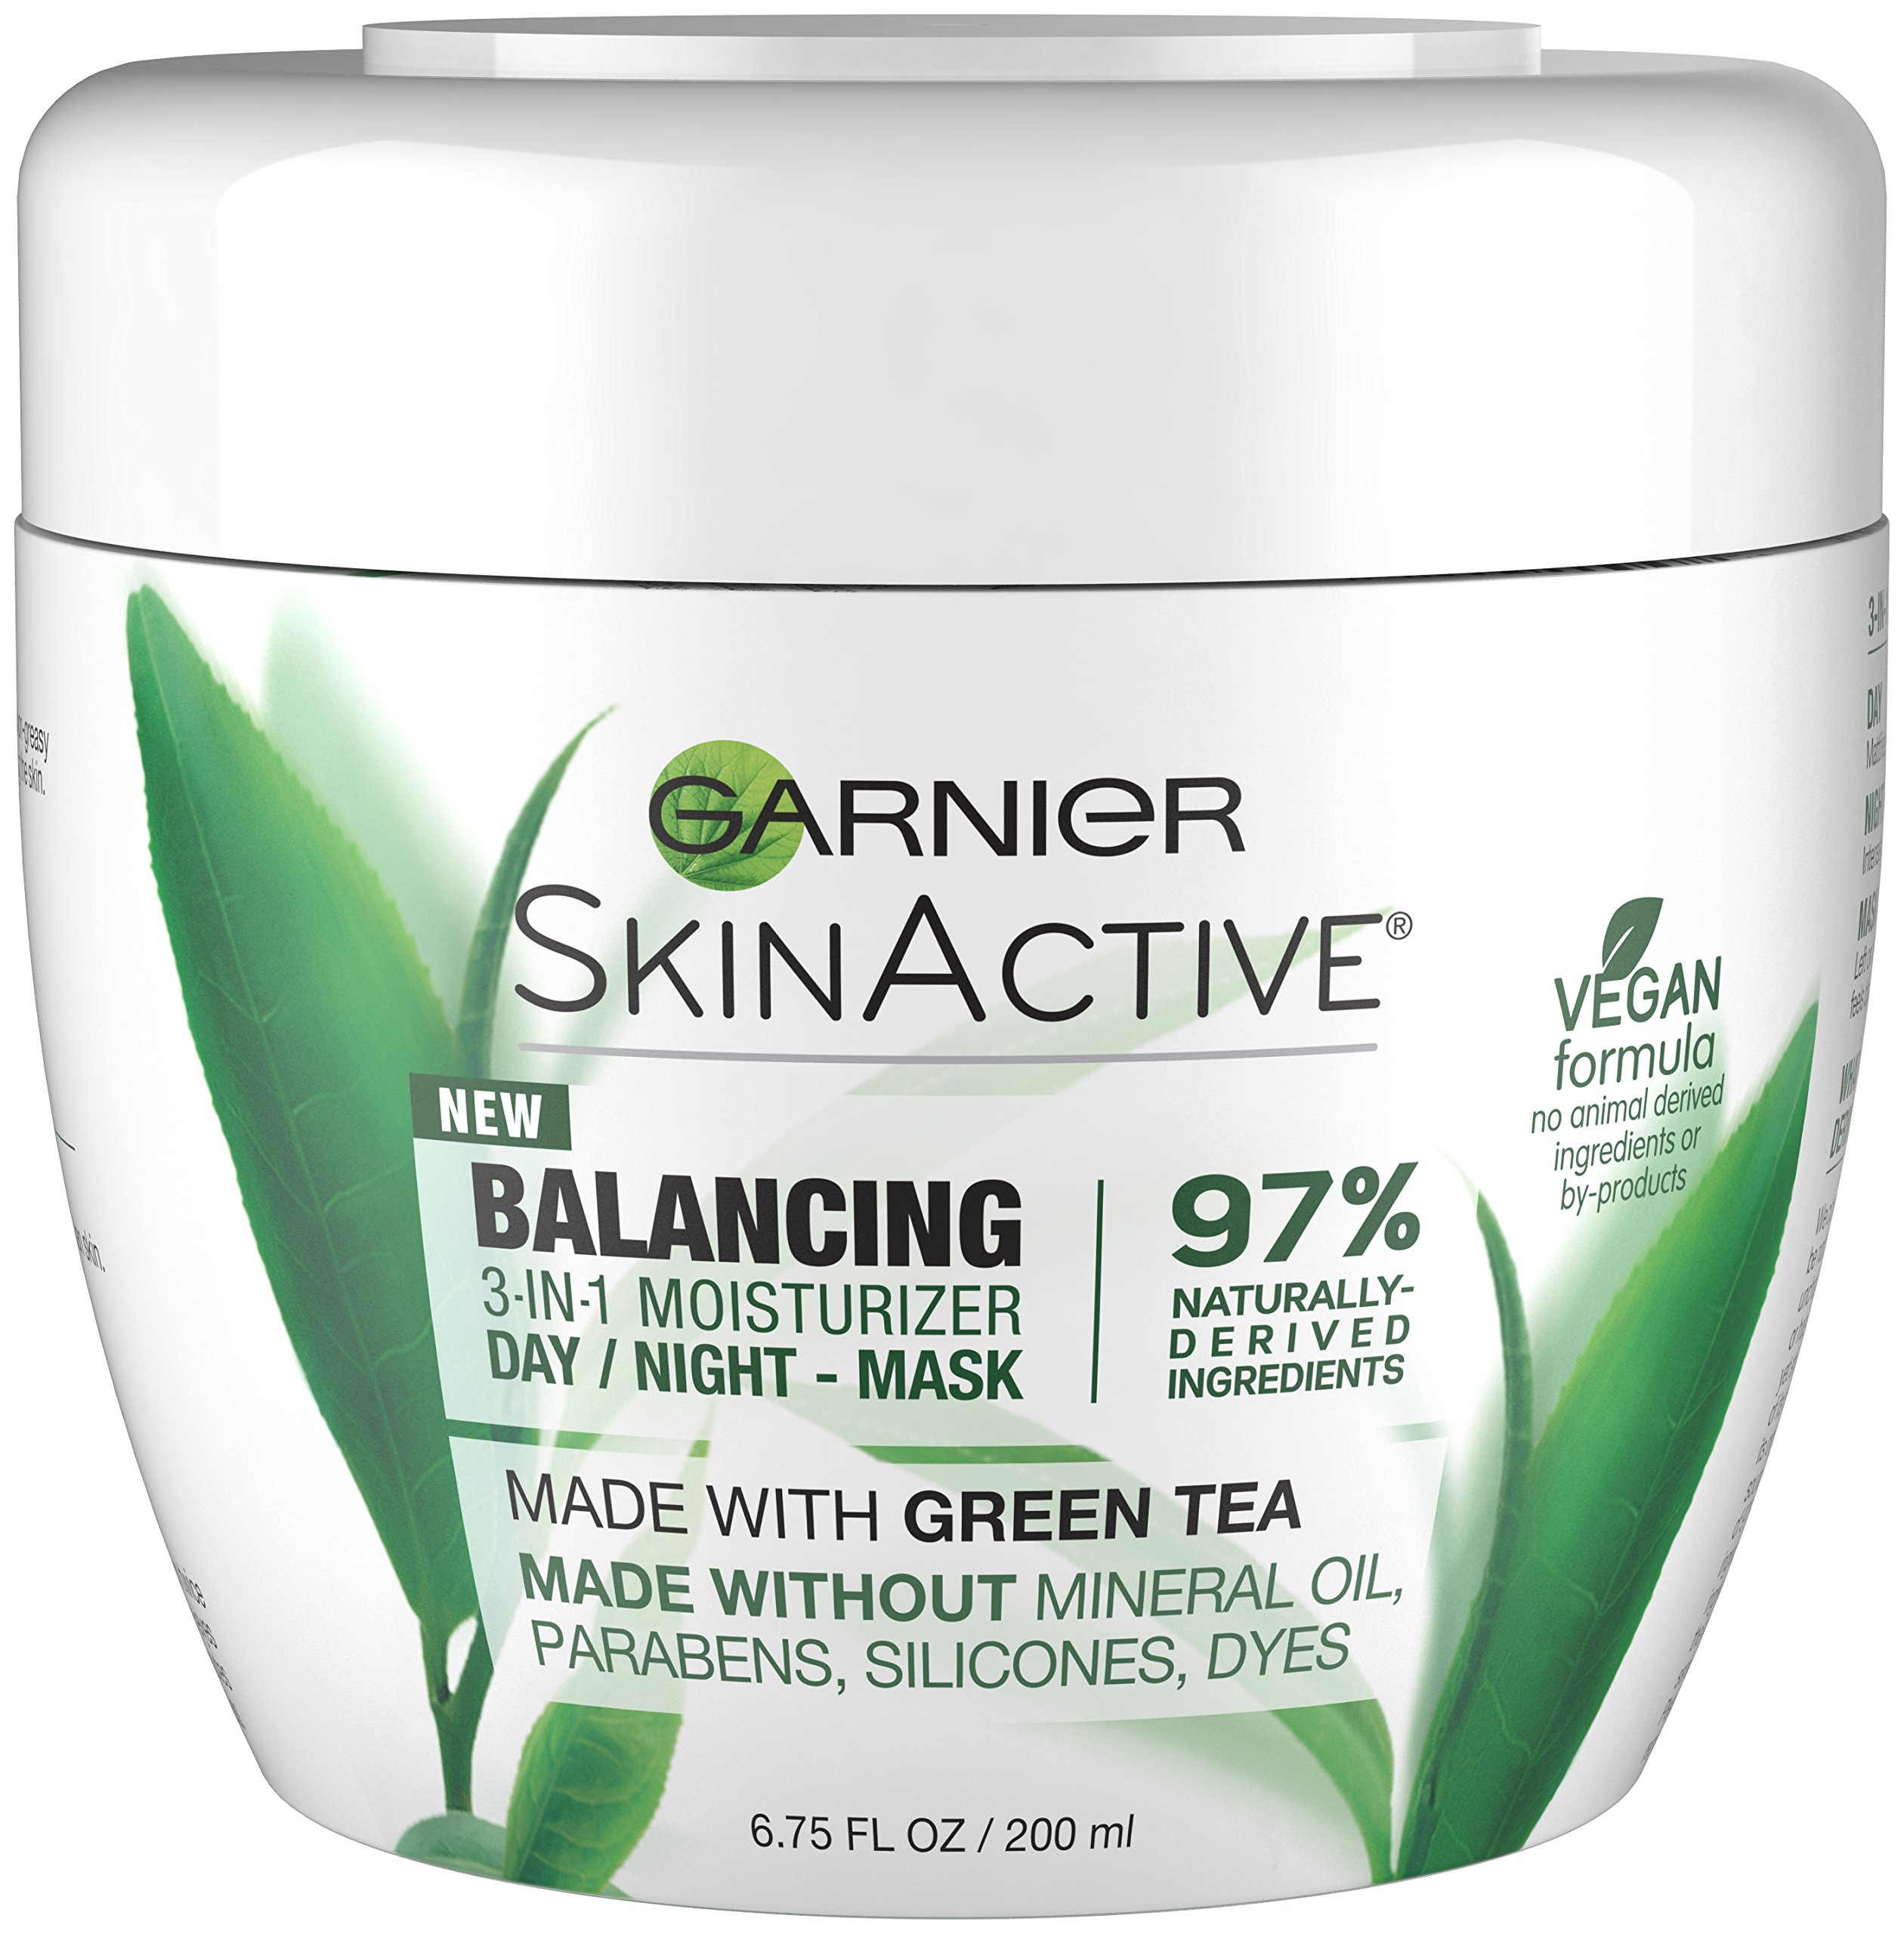 Garnier series Clean skin (3 in 1): reviews, composition, instruction 87